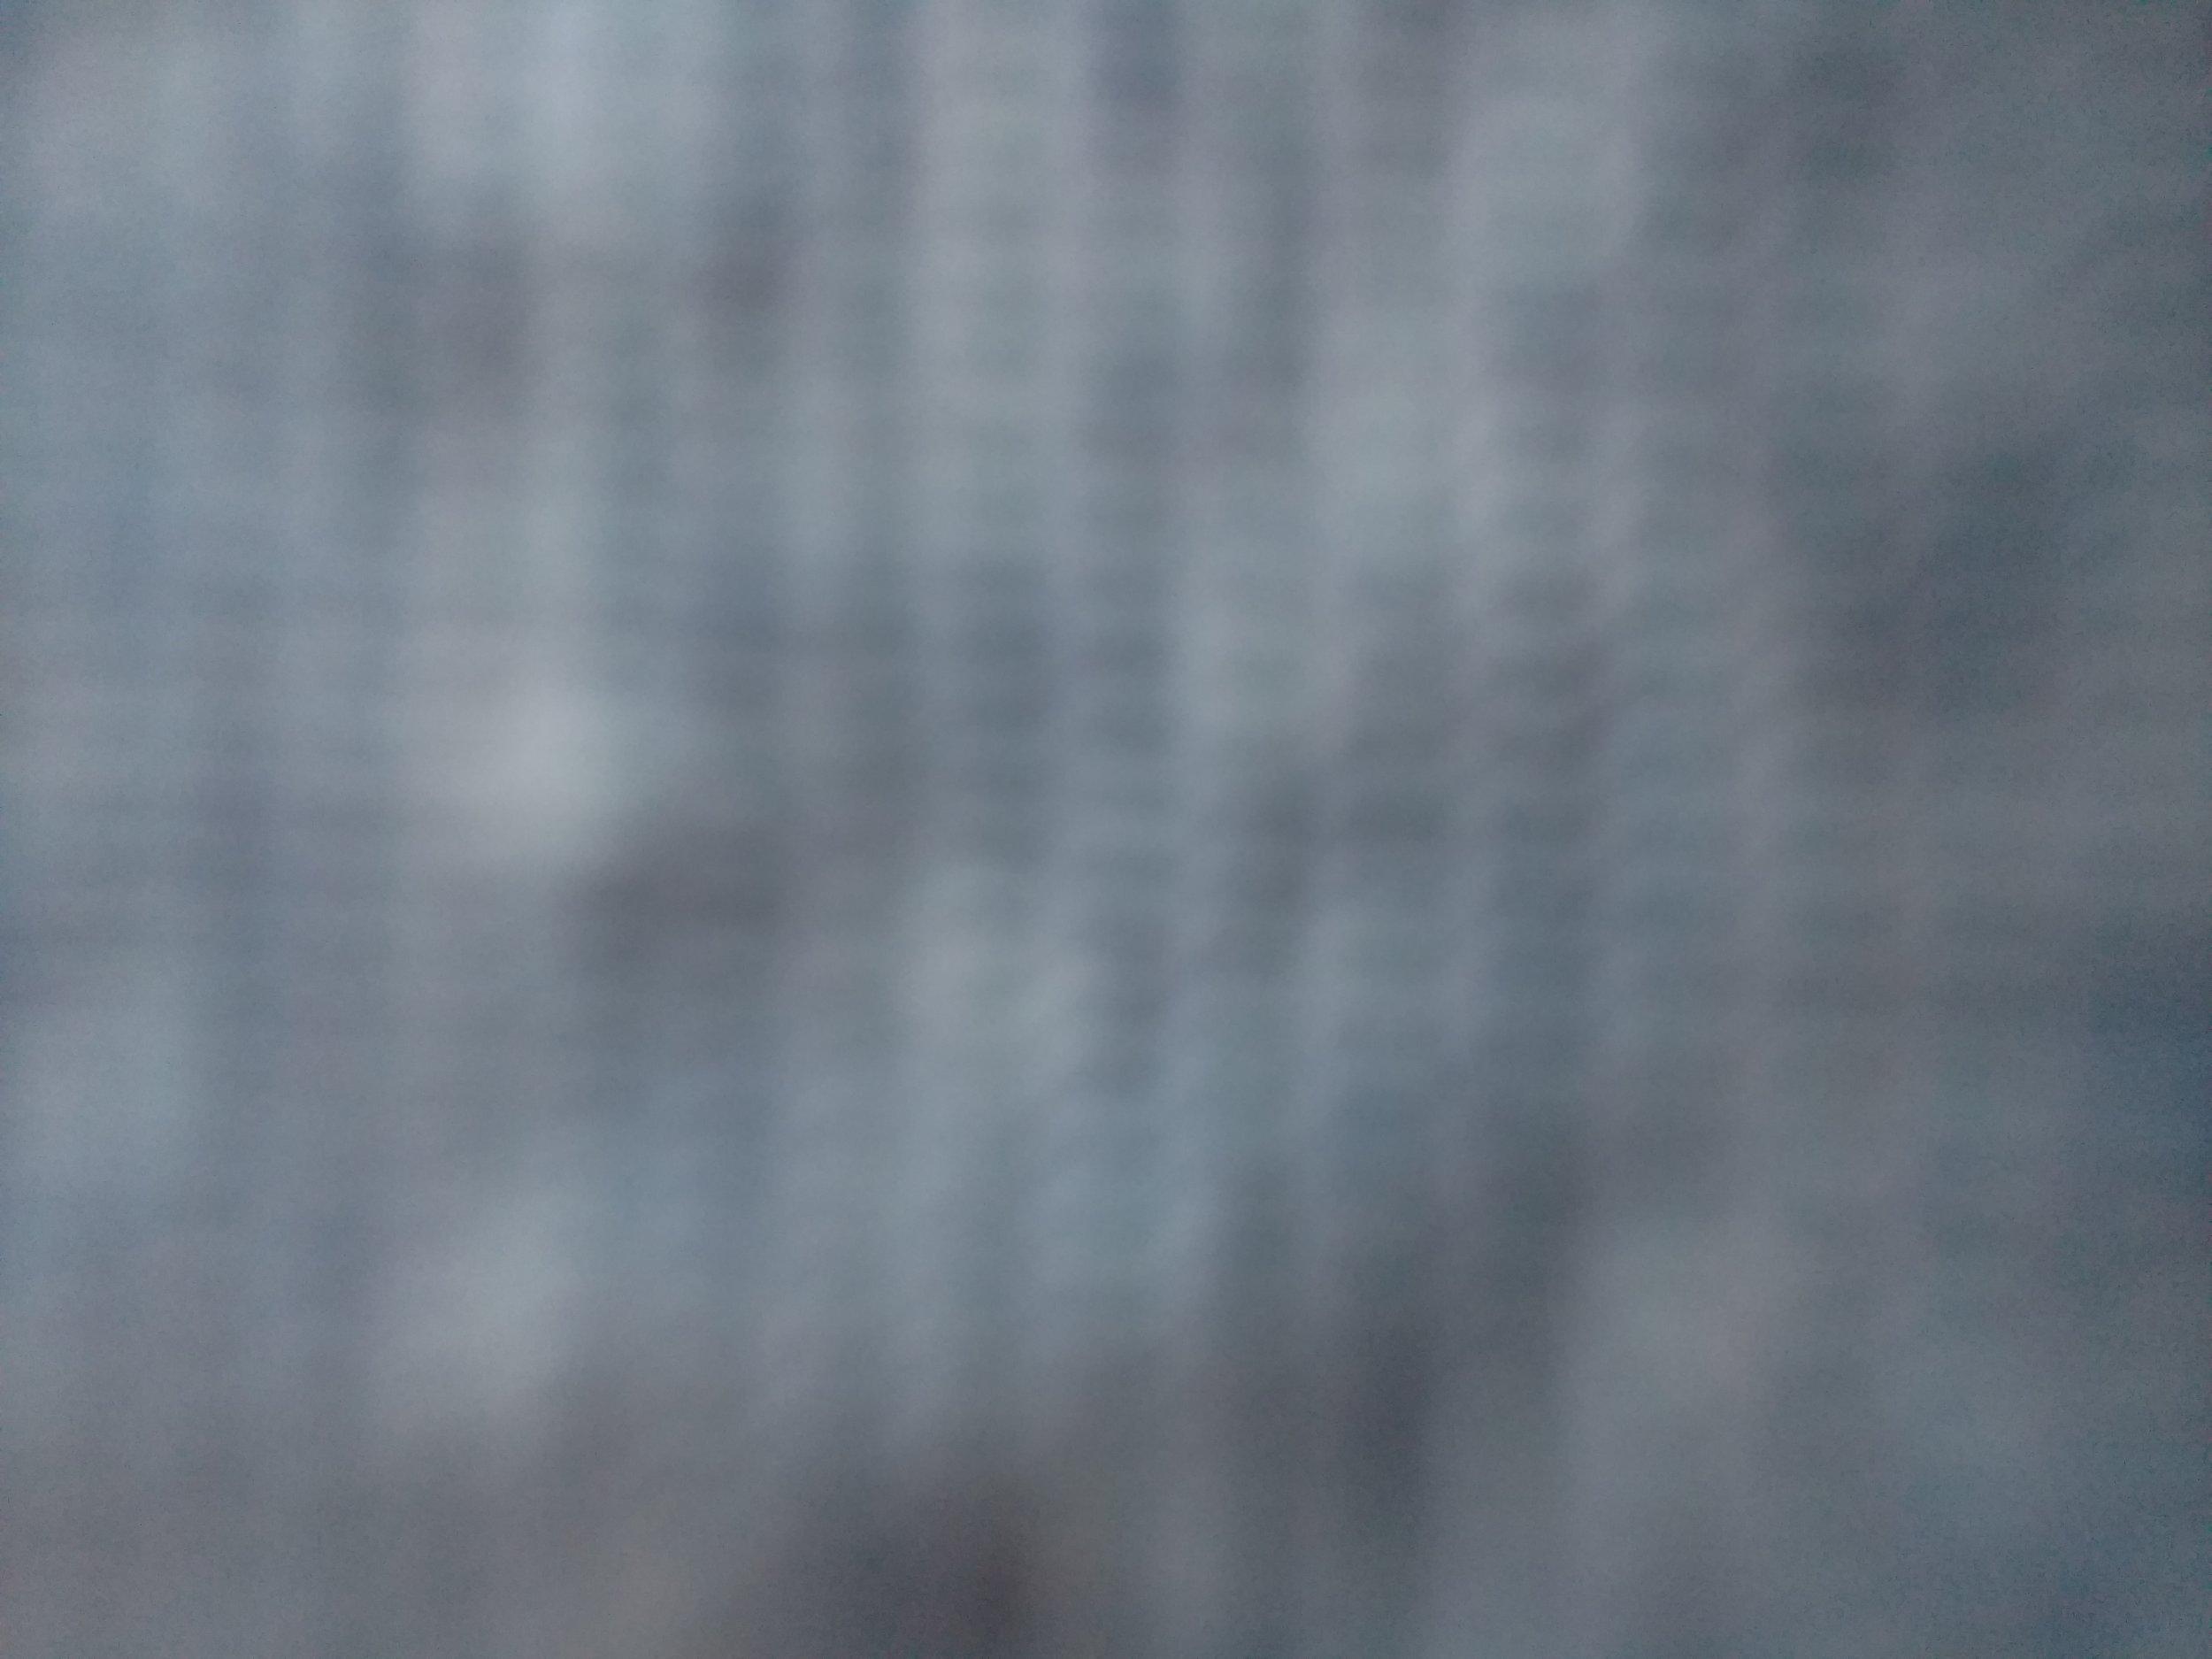 willroth-co-free-texture-gradient-056.jpg